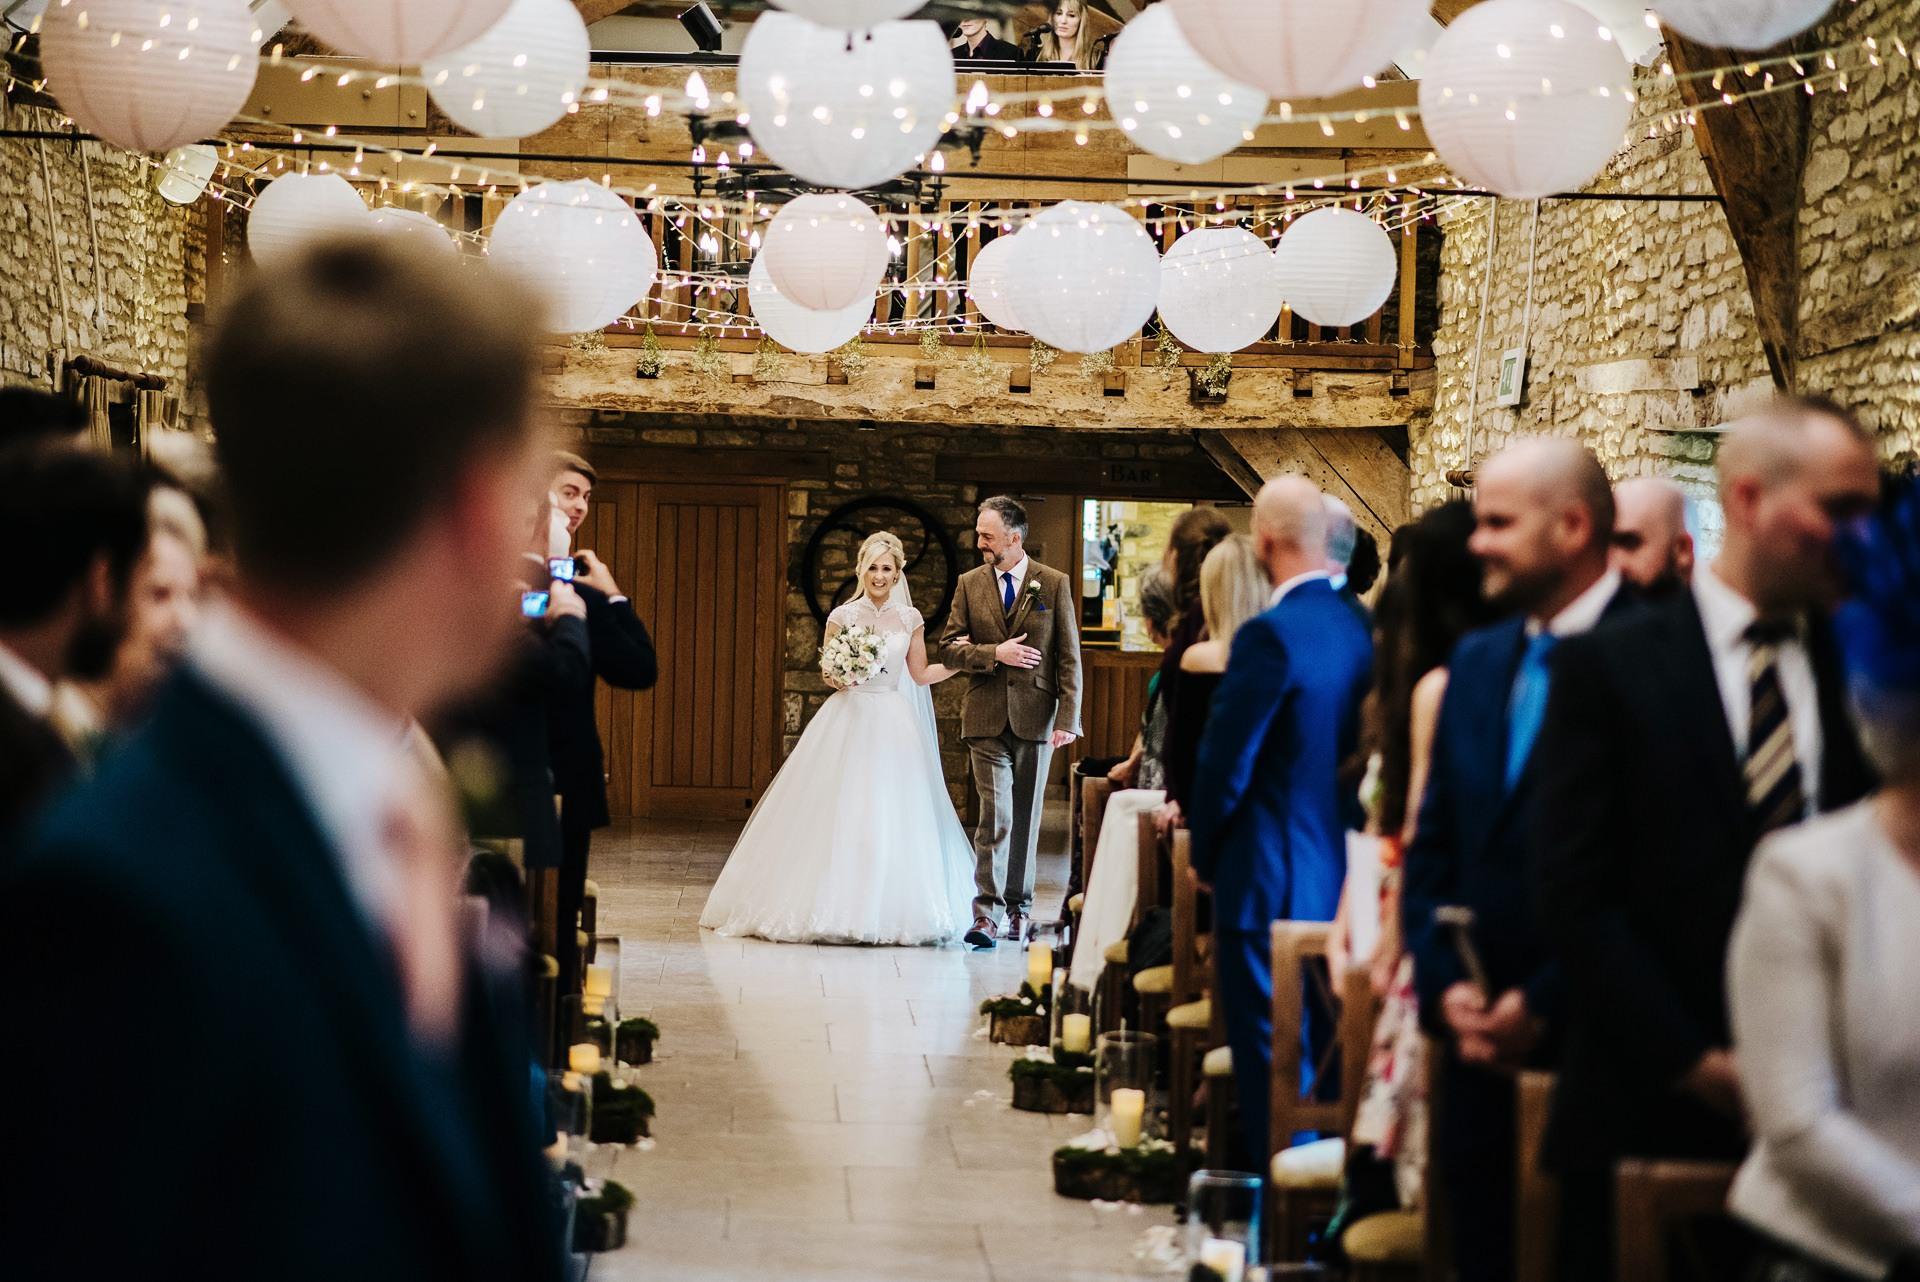 Caswell House Wedding Photographer - Jessica & Chris 4